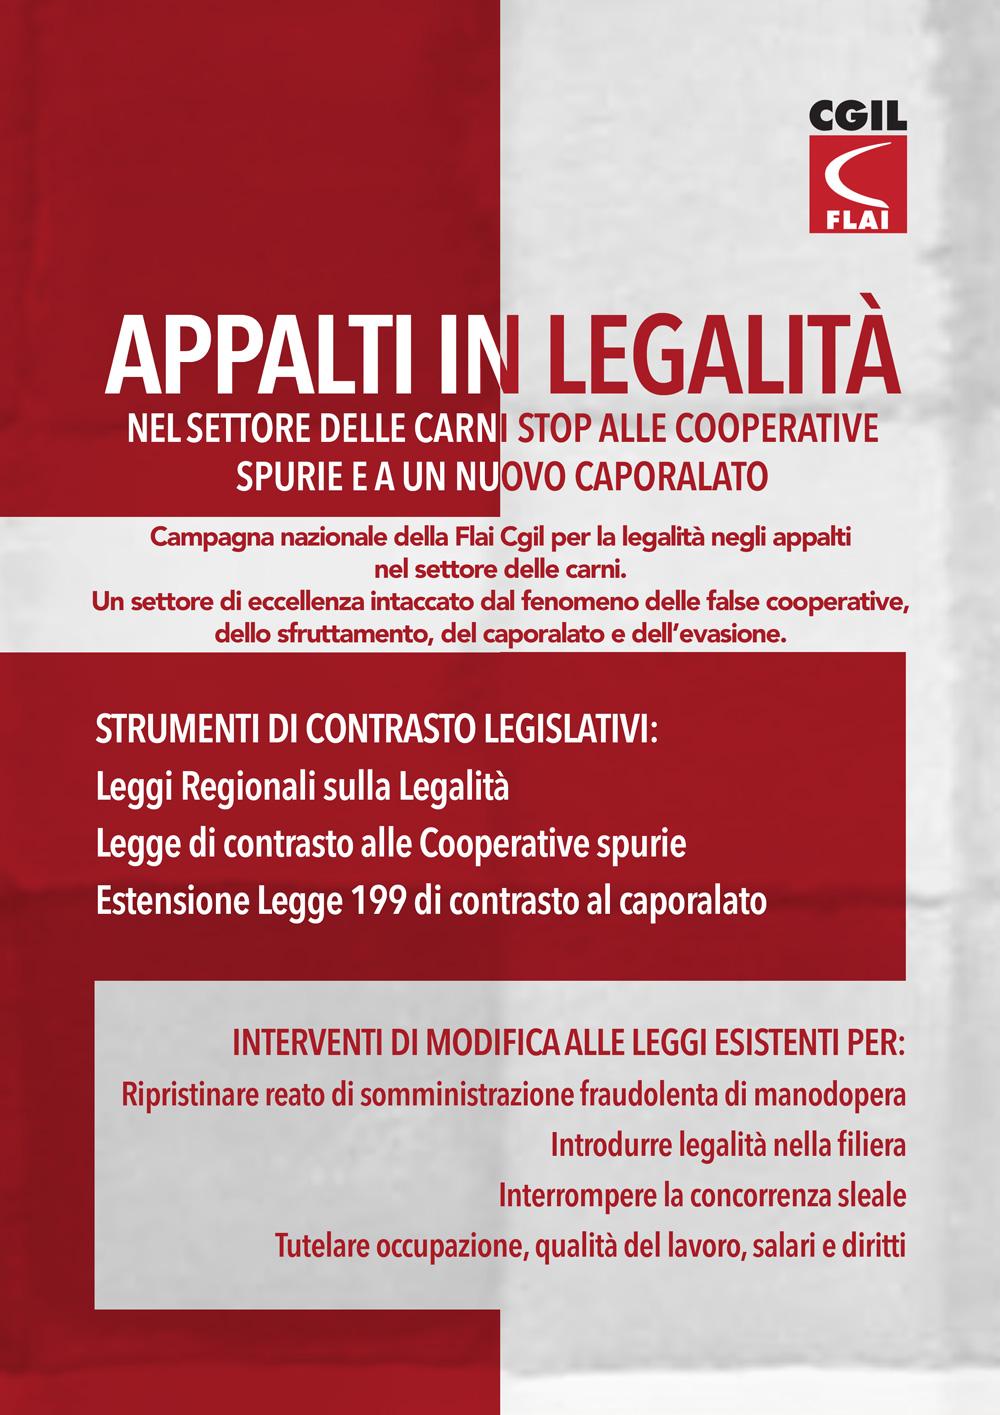 Appalti_in_Legalità